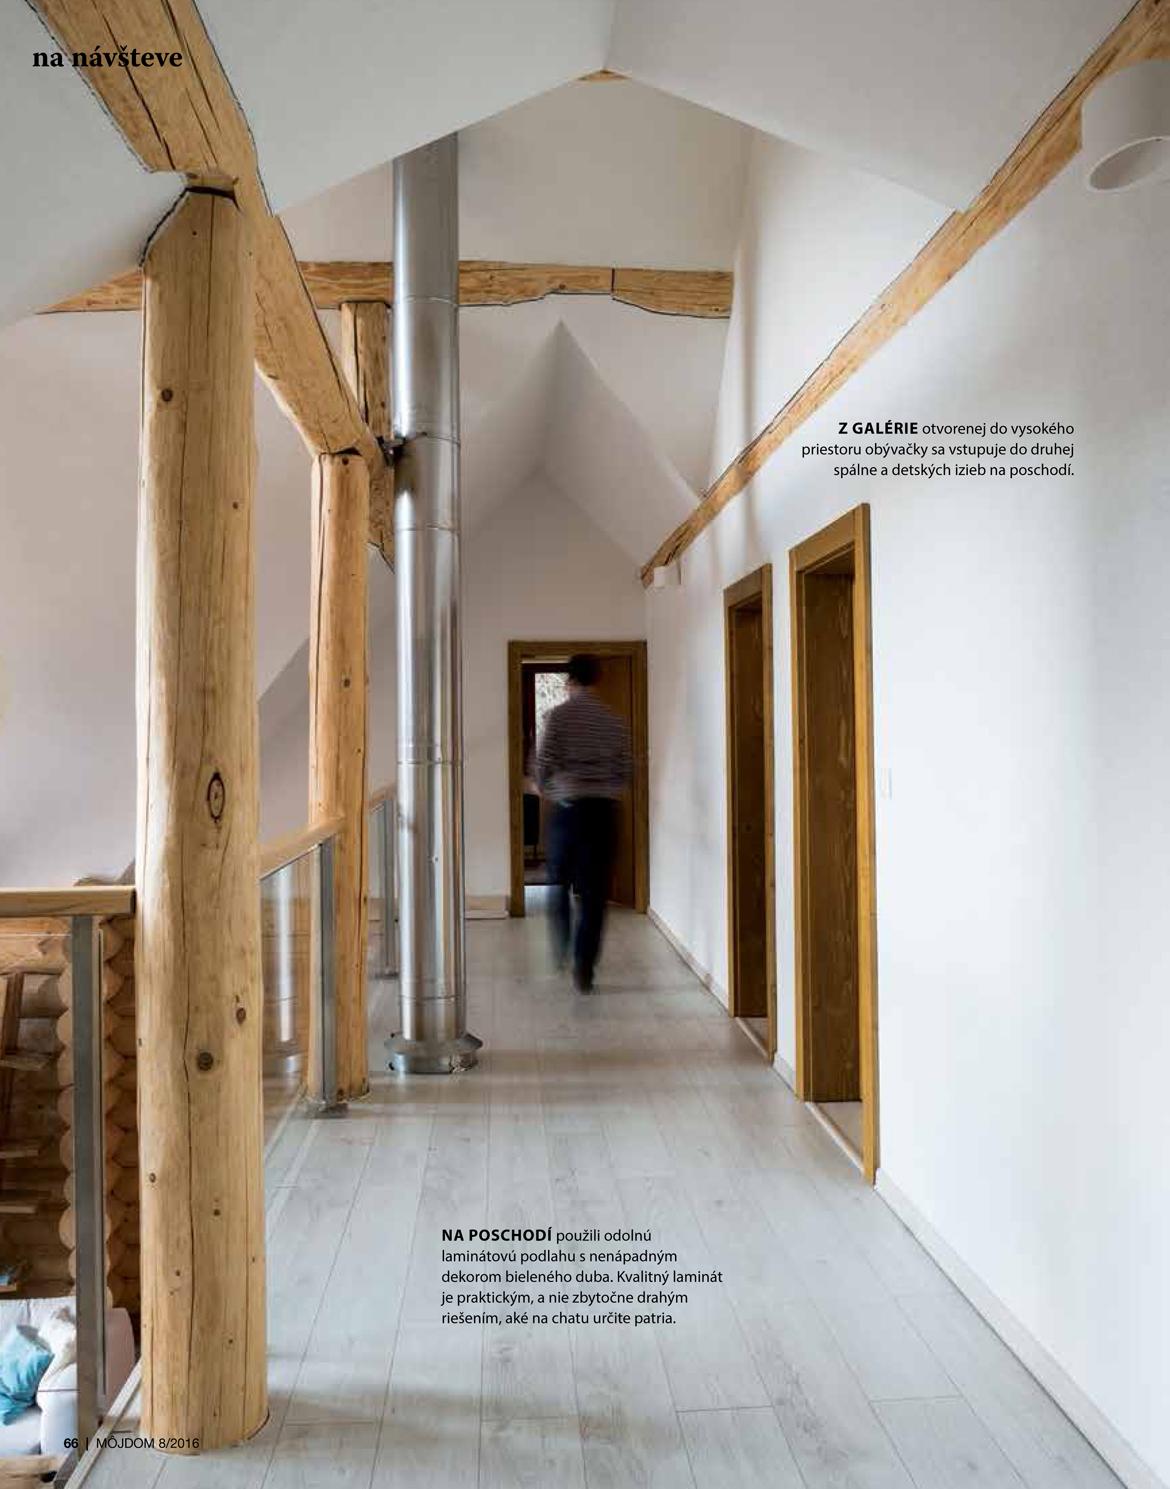 011-interier-zrub-tale-mojdom-pavlech-architekti